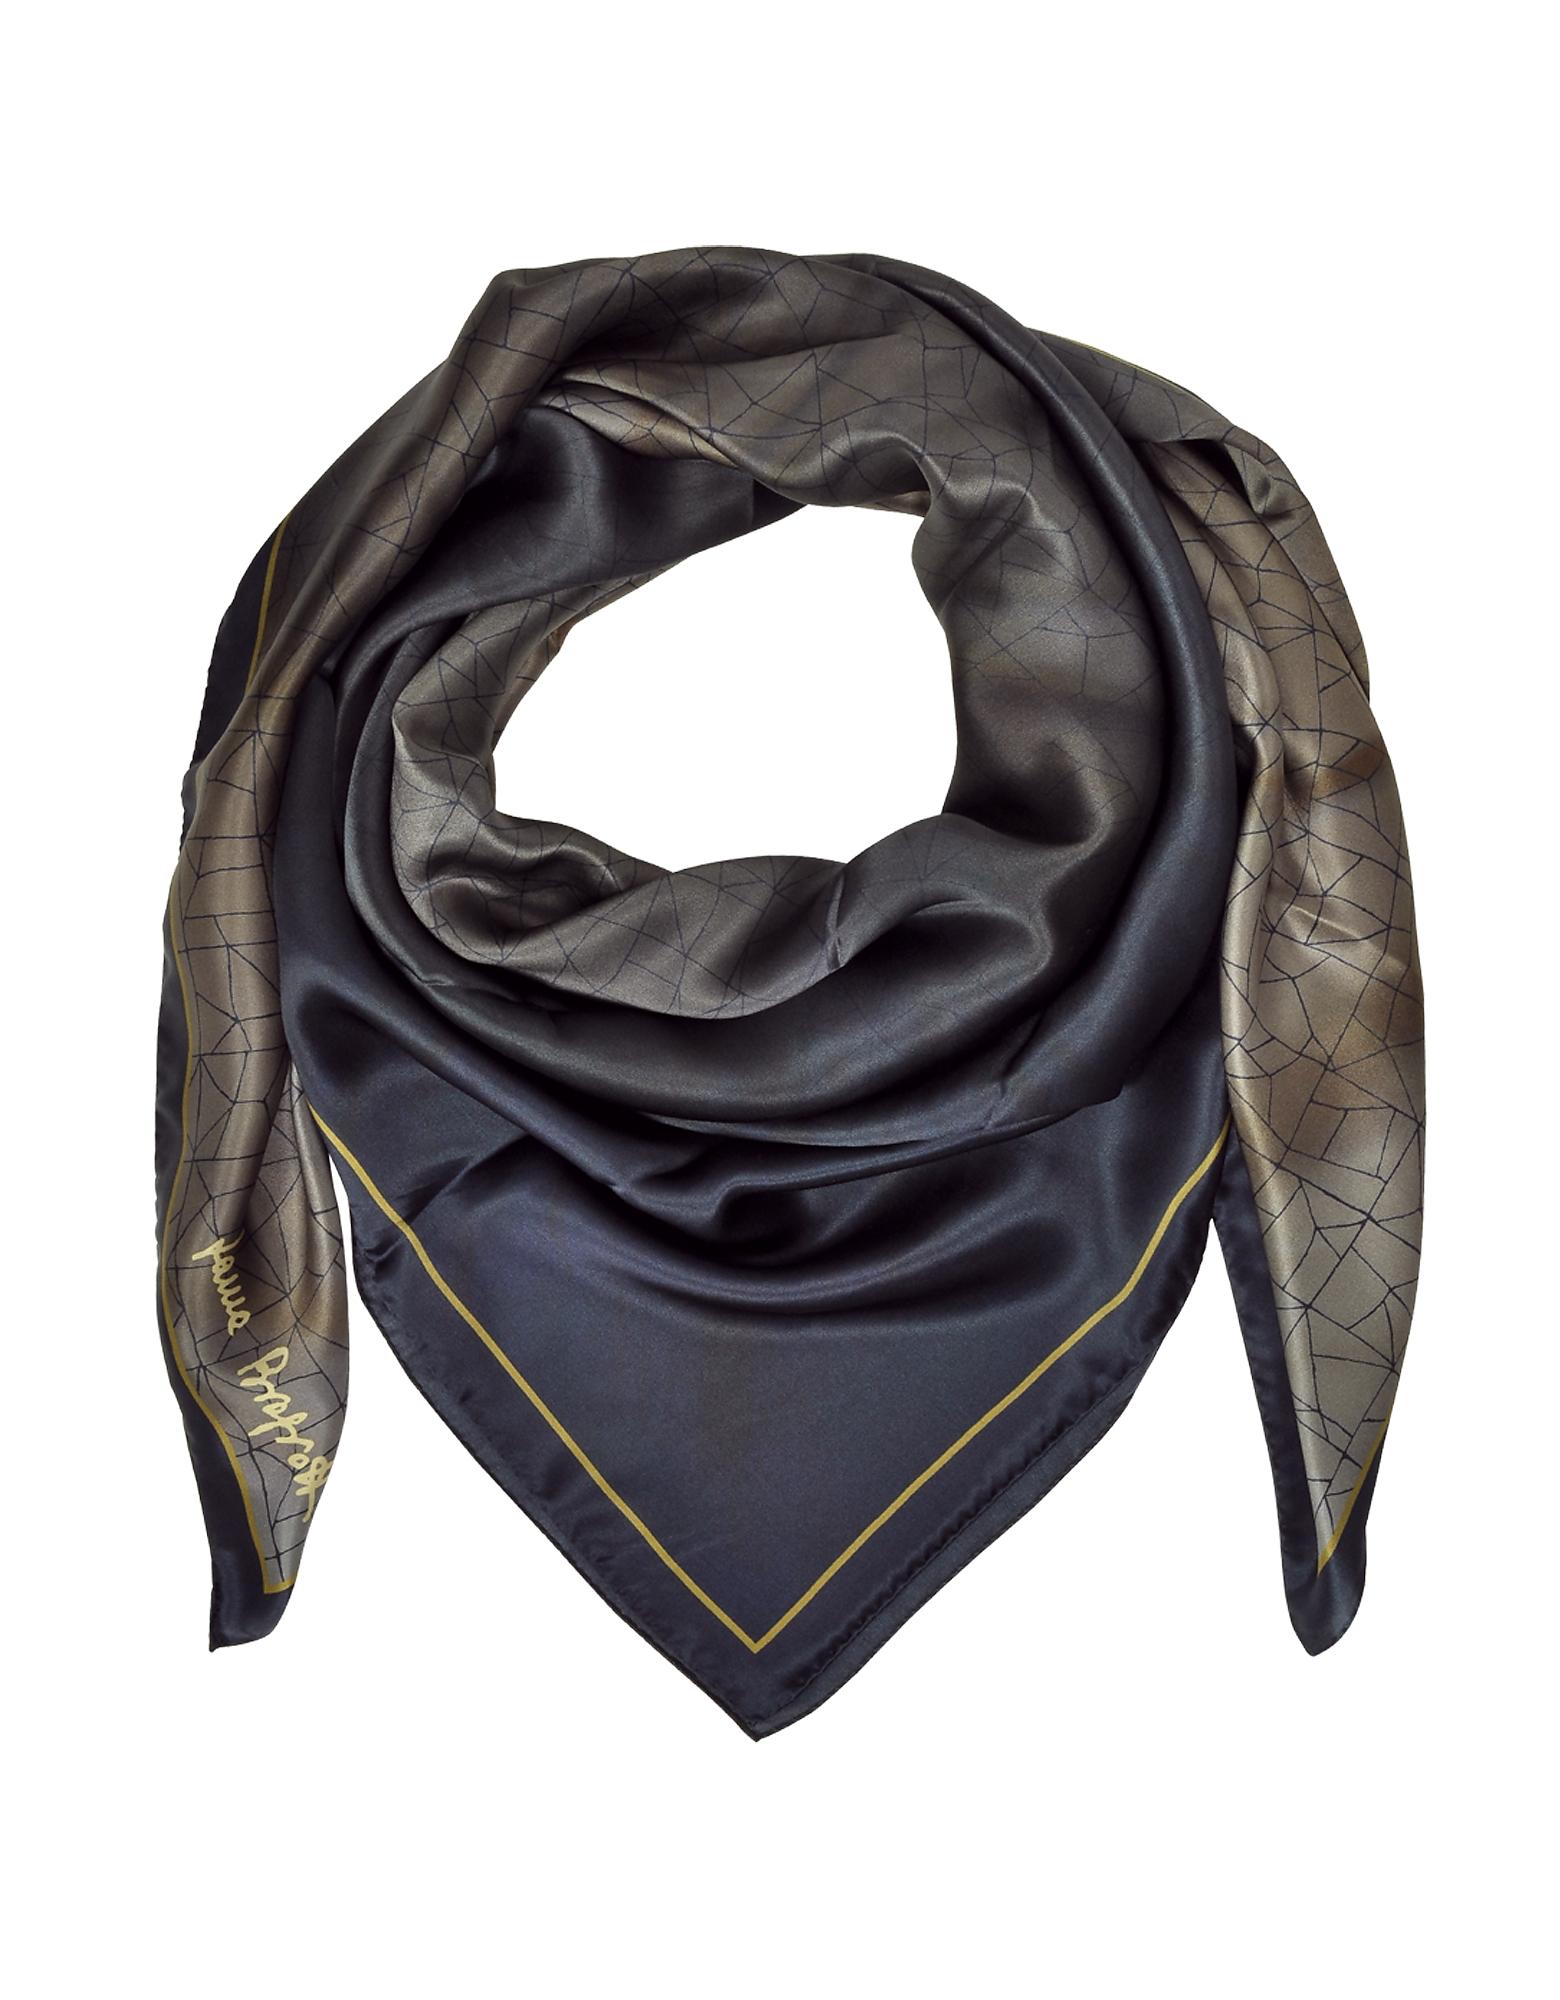 Laura Biagiotti Shawls & Wraps, Shaded Geometric Printed Silk Shawl